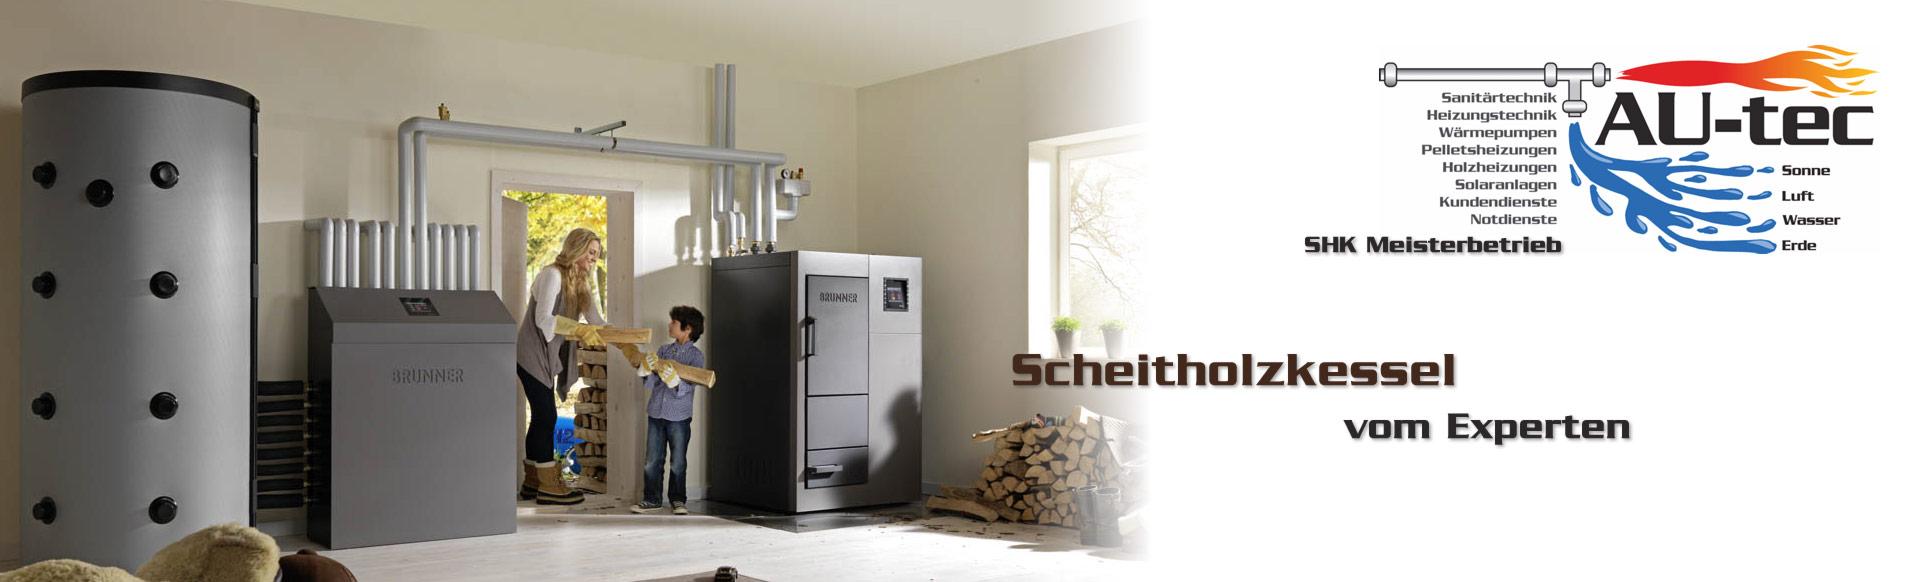 scheitholzkessel-rastatt-header-autecnet